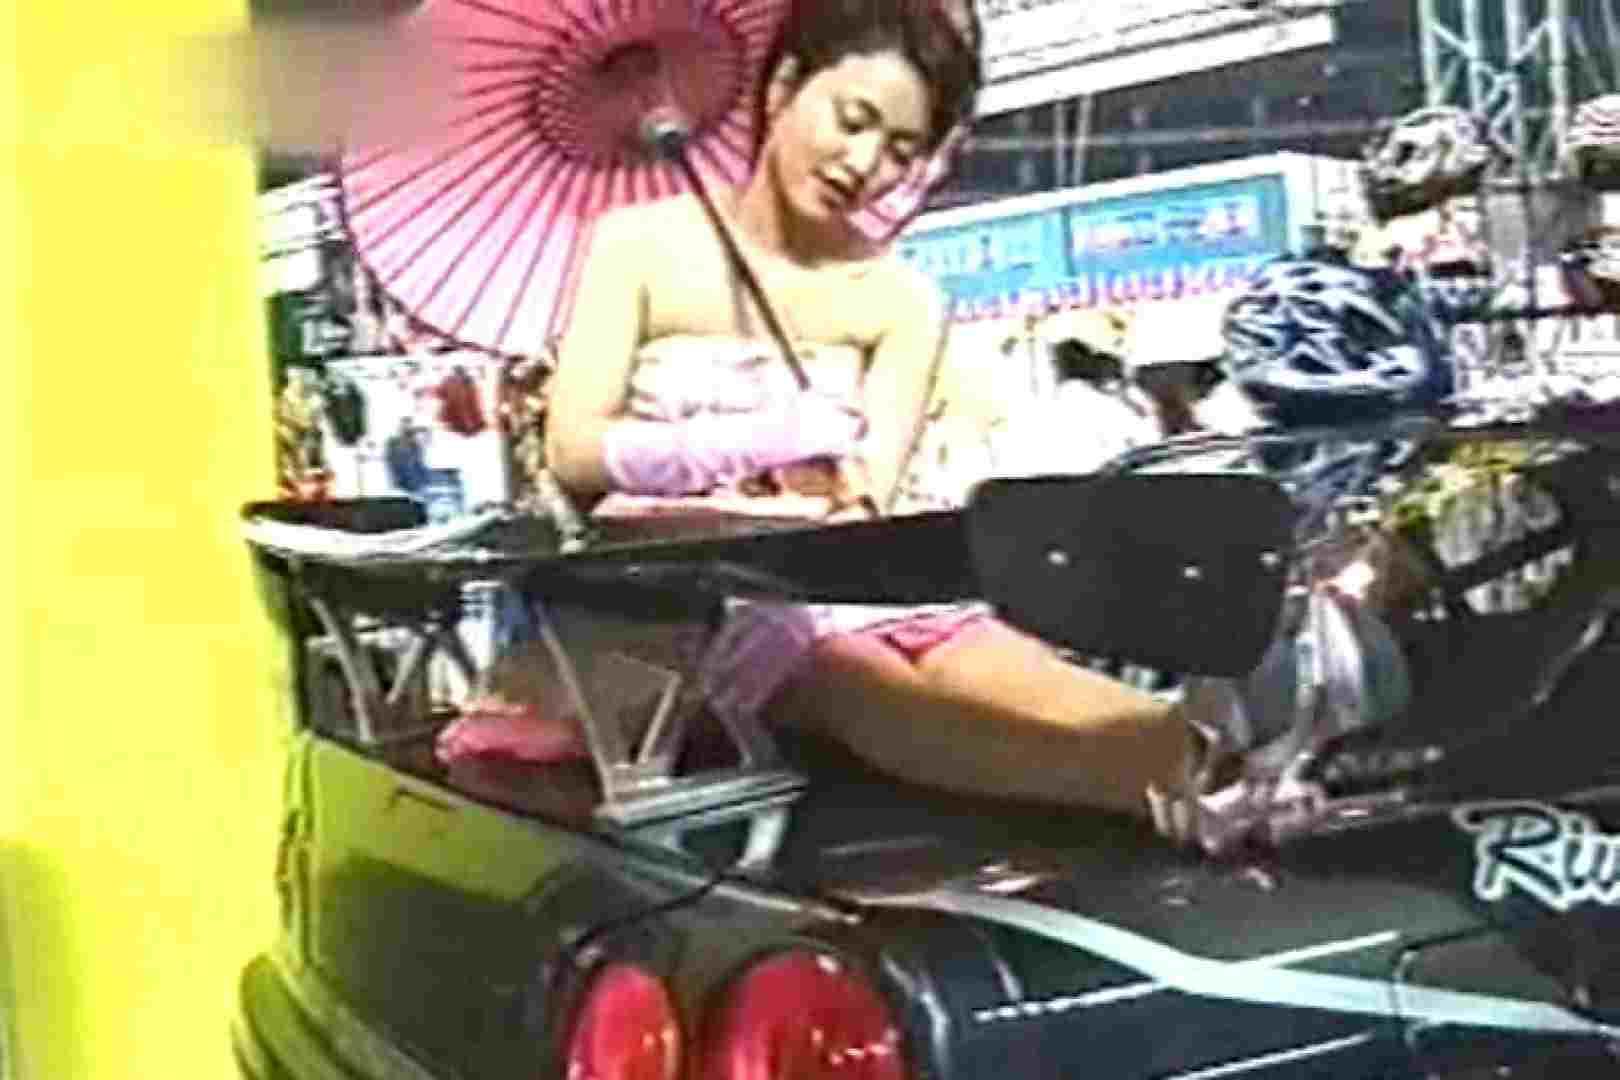 RQカメラ地獄Vol.24 お姉さん丸裸 | 美しいOLの裸体  95pic 27